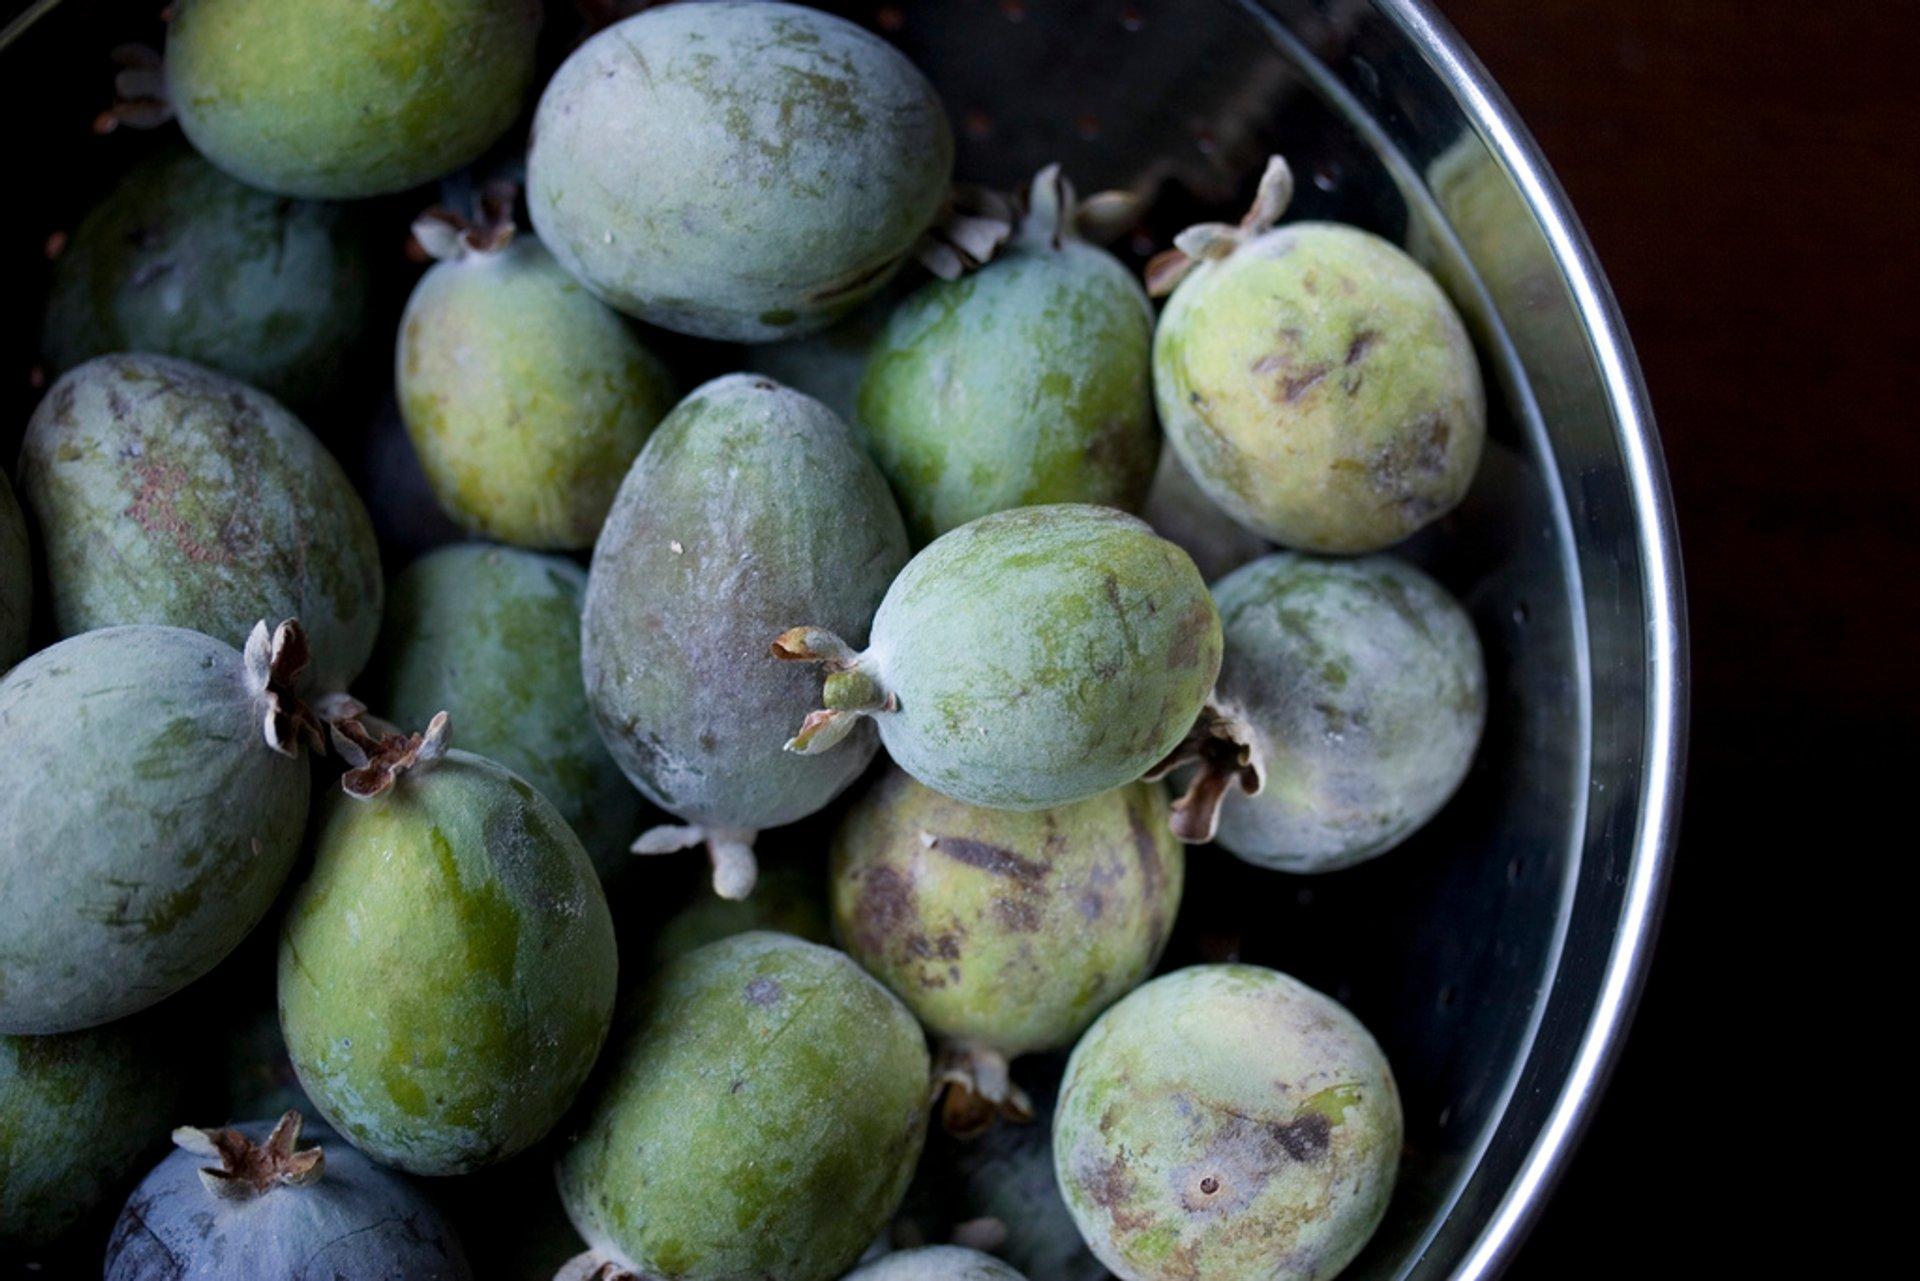 Guava or Goiaba in Rio de Janeiro 2020 - Best Time